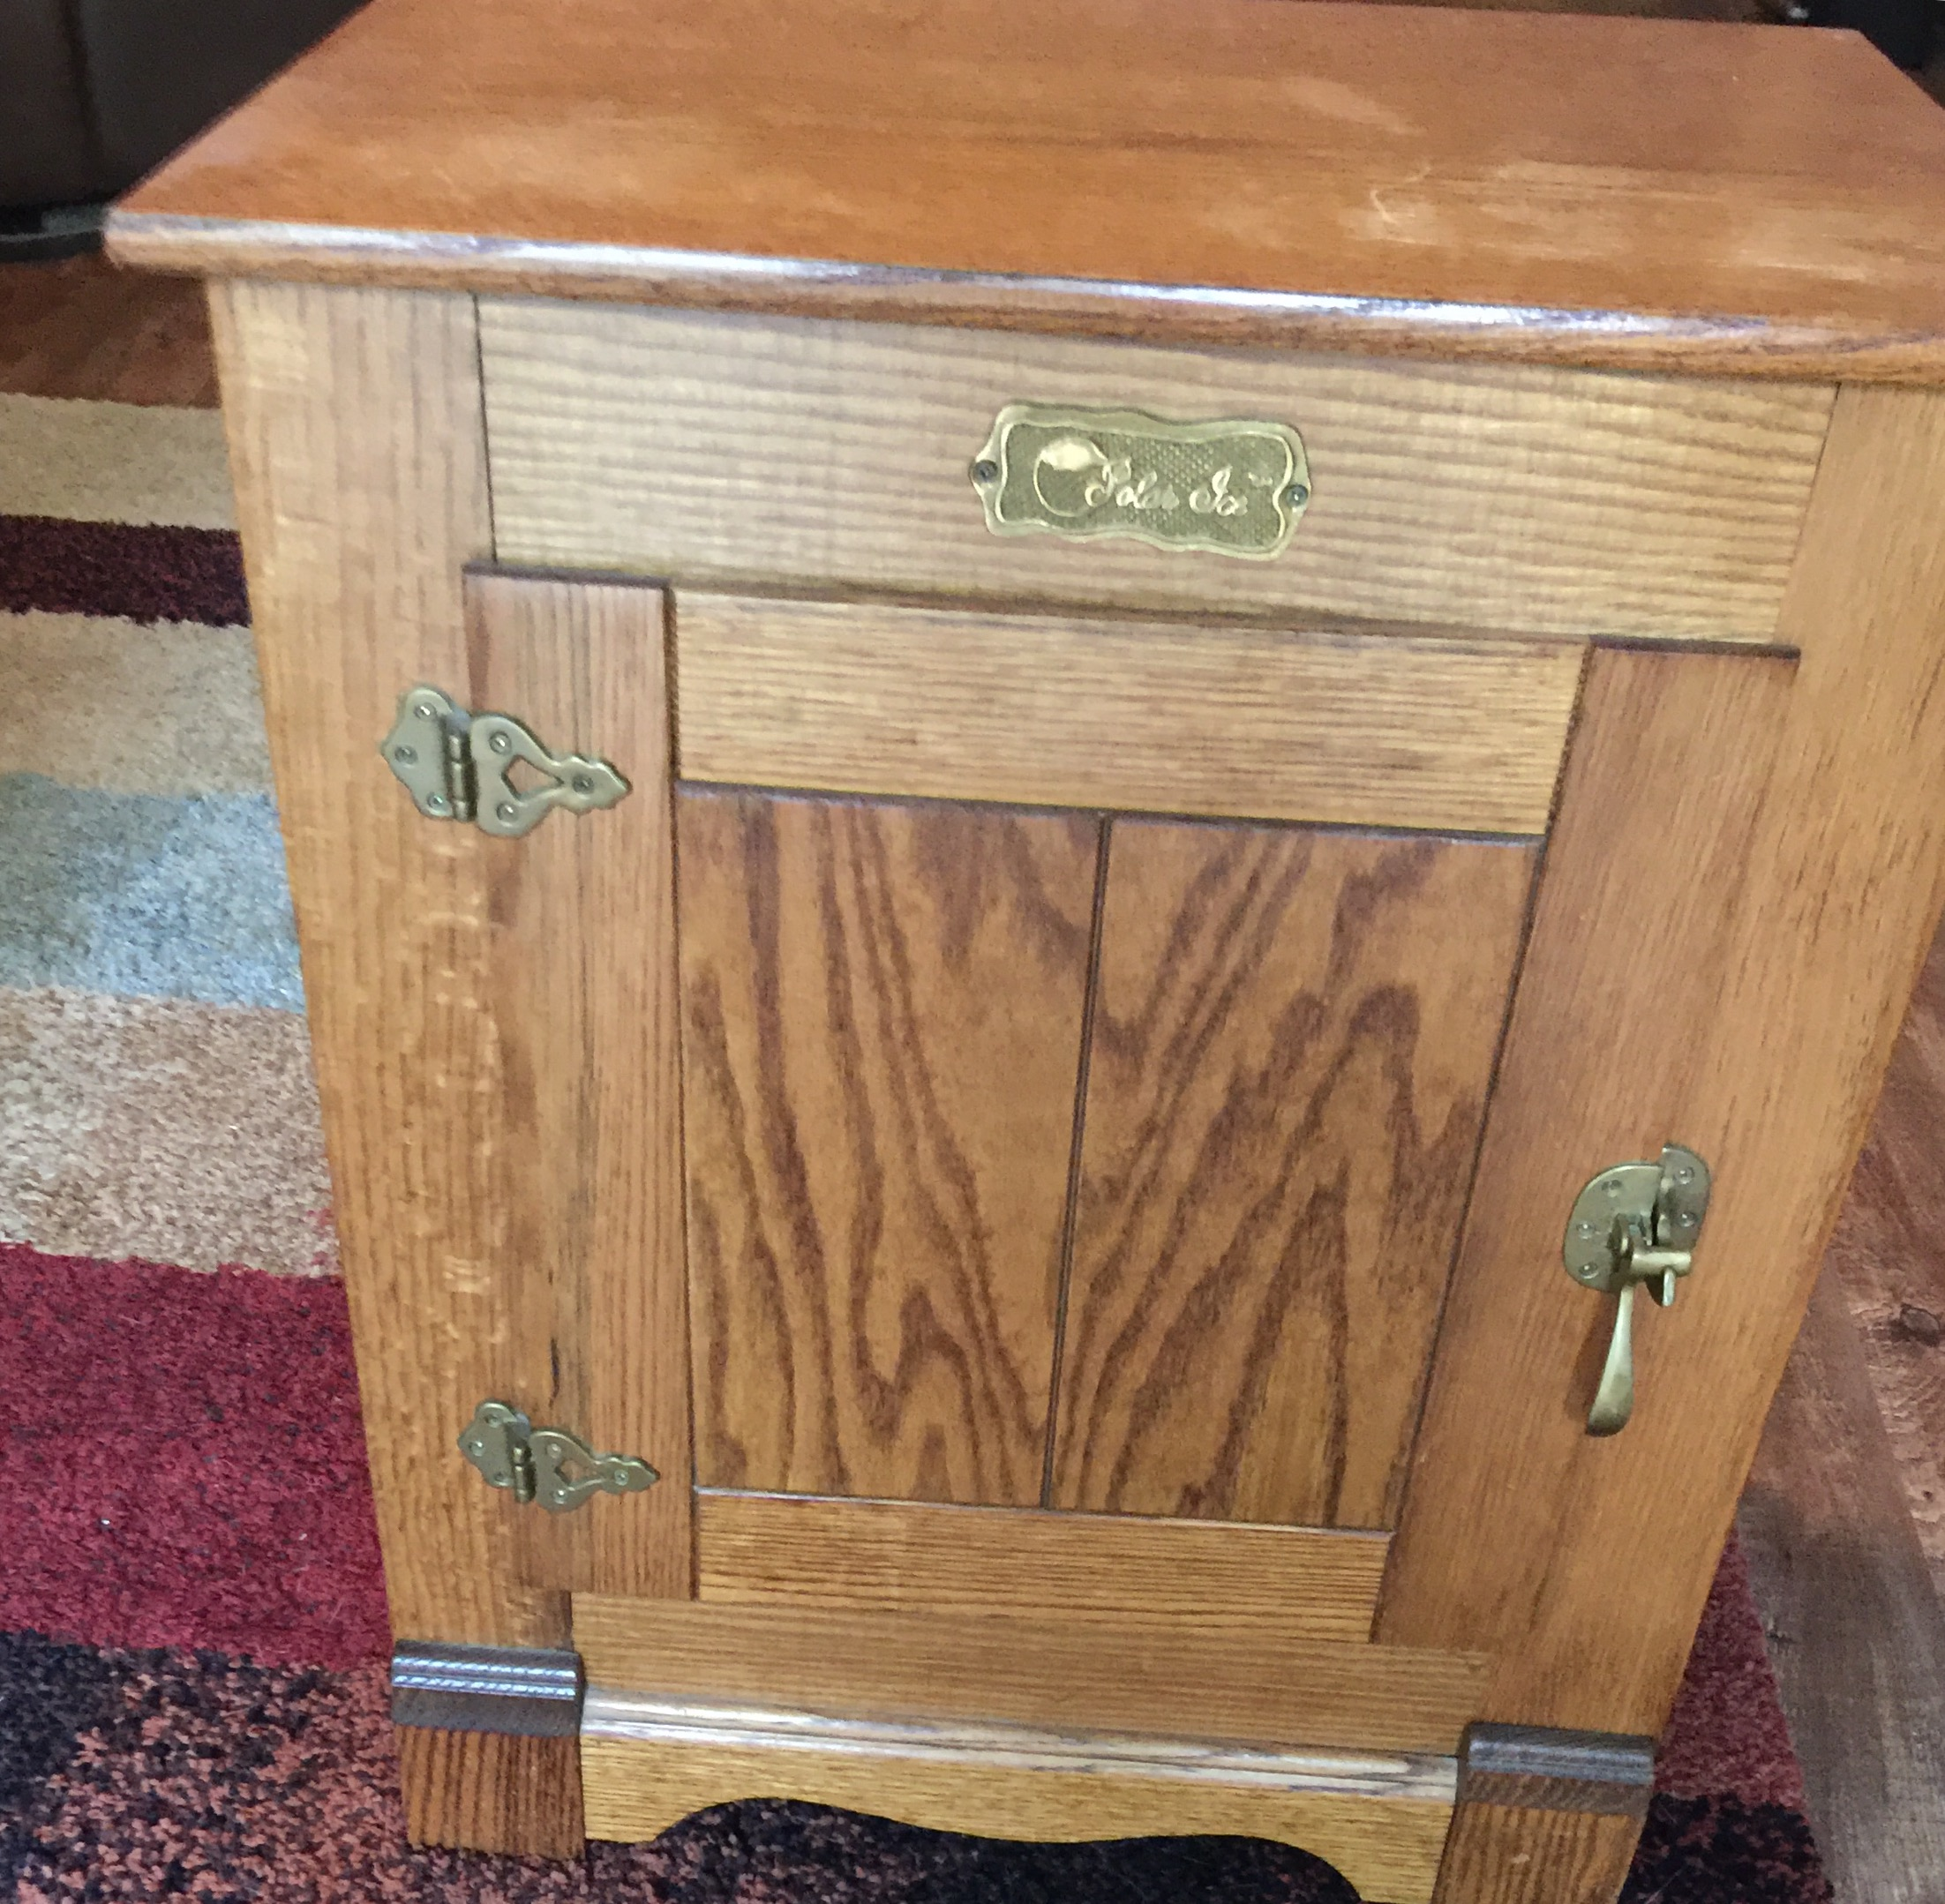 antique ice box brands Polar Ice Brand Ice box antique appraisal | InstAppraisal antique ice box brands